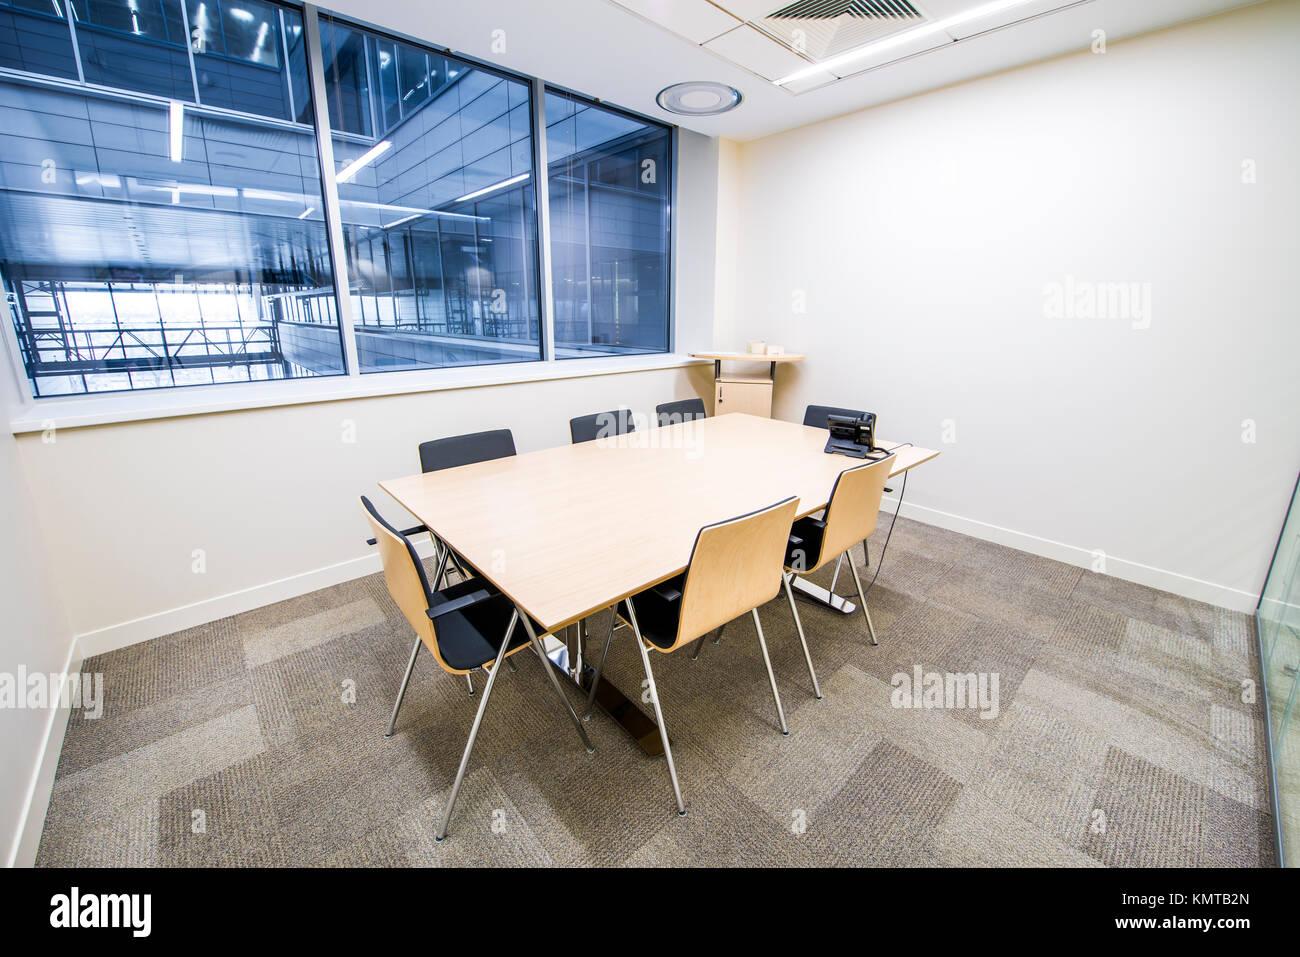 Empty small meeting room. bright modern interior. glass walls stock